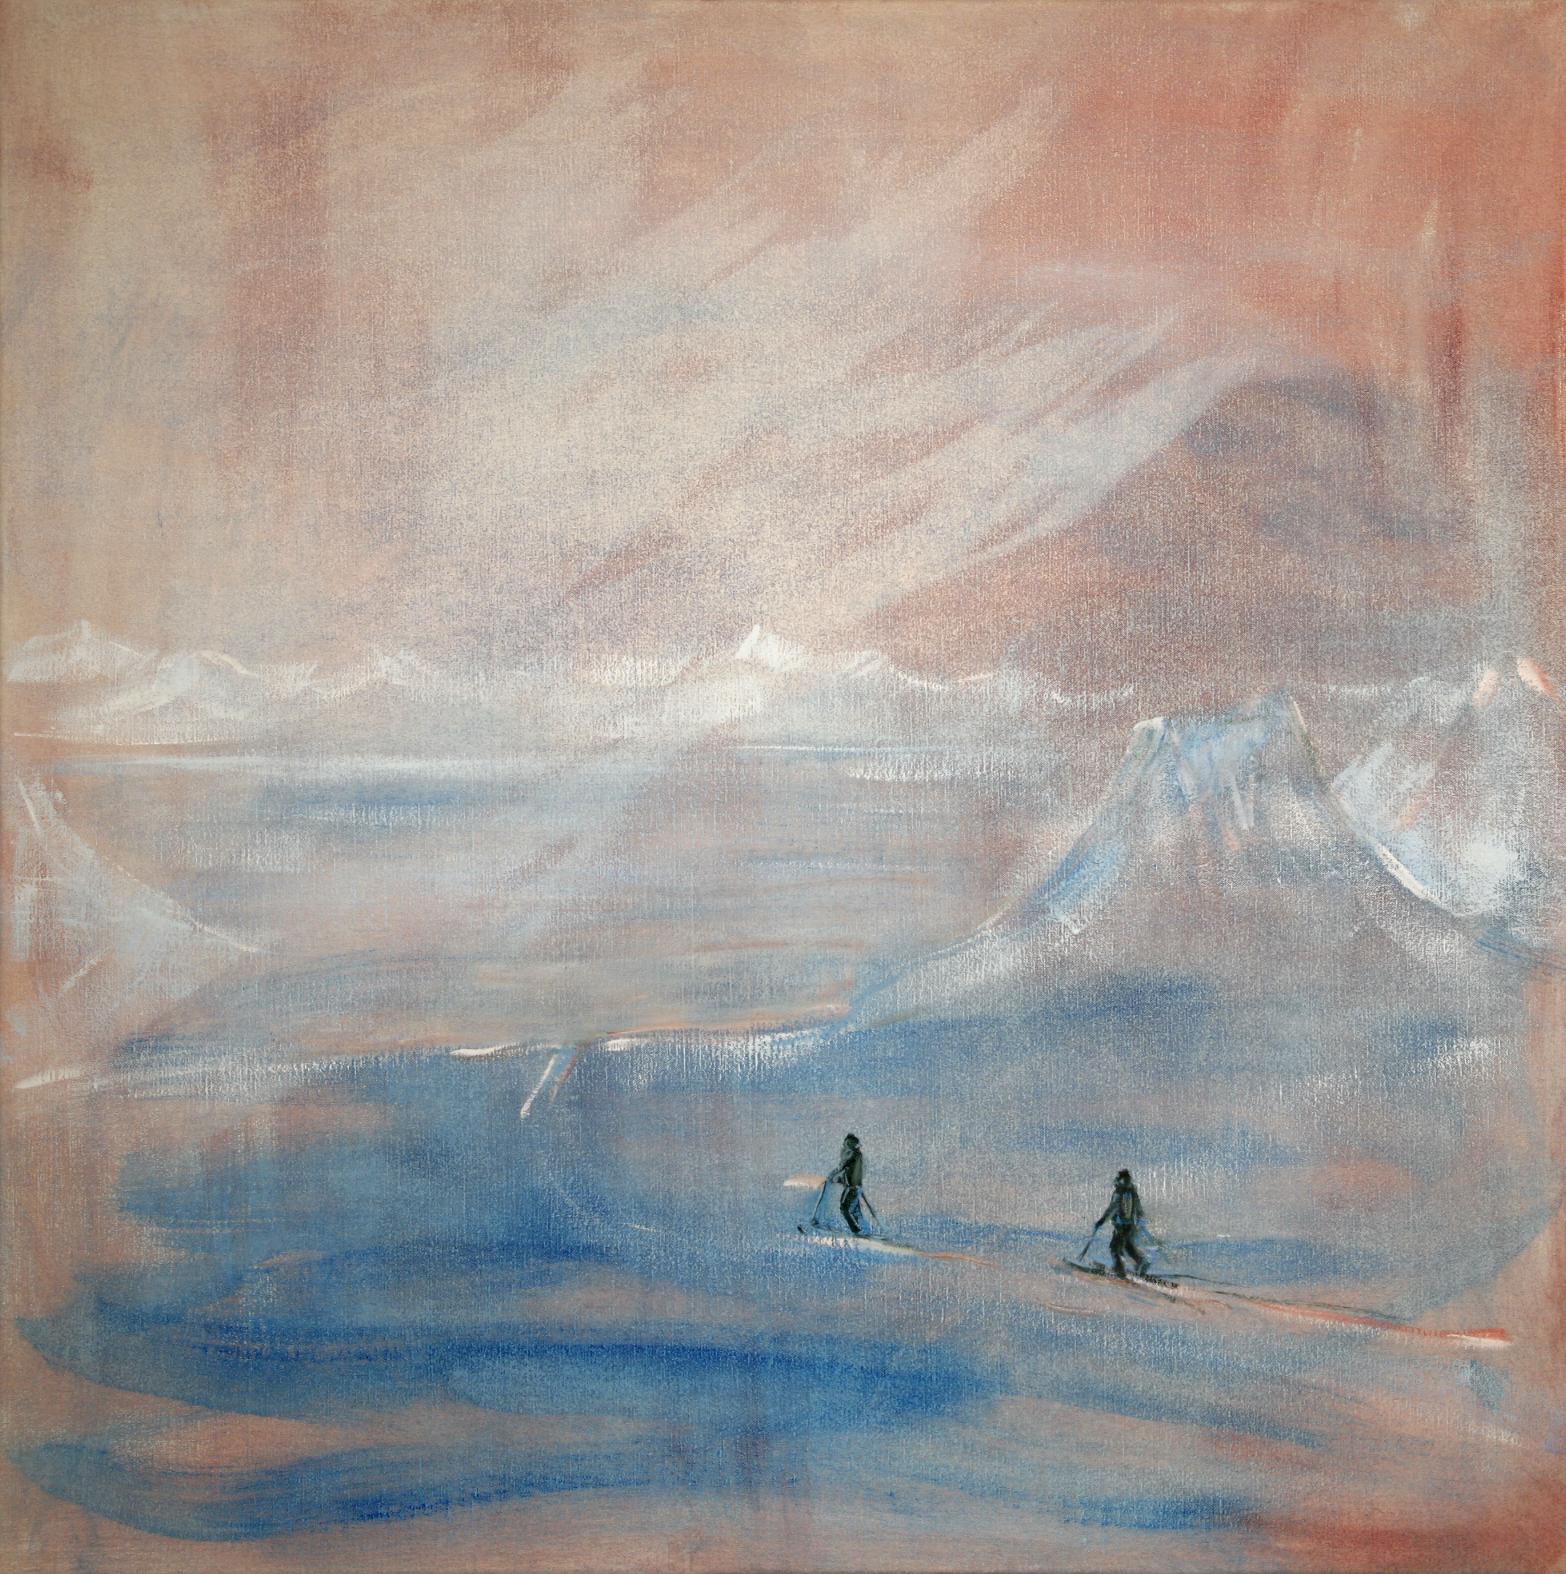 svalbard alpen glow pink alpine arctic painting oil ski touring mountains mountaineering